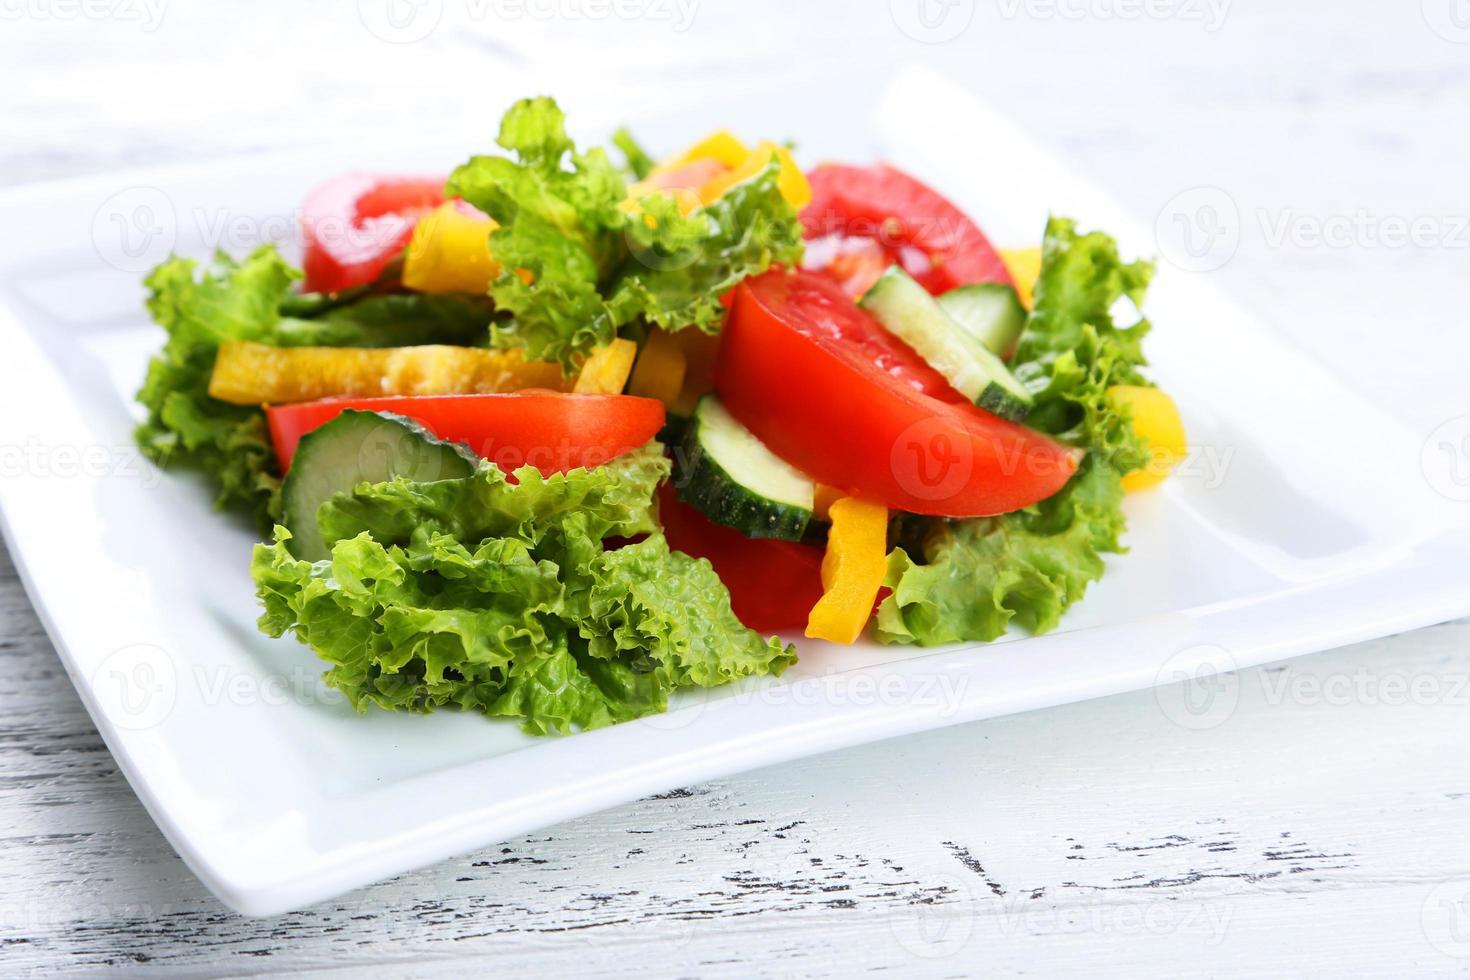 insalata di verdure fresche su fondo di legno bianco foto